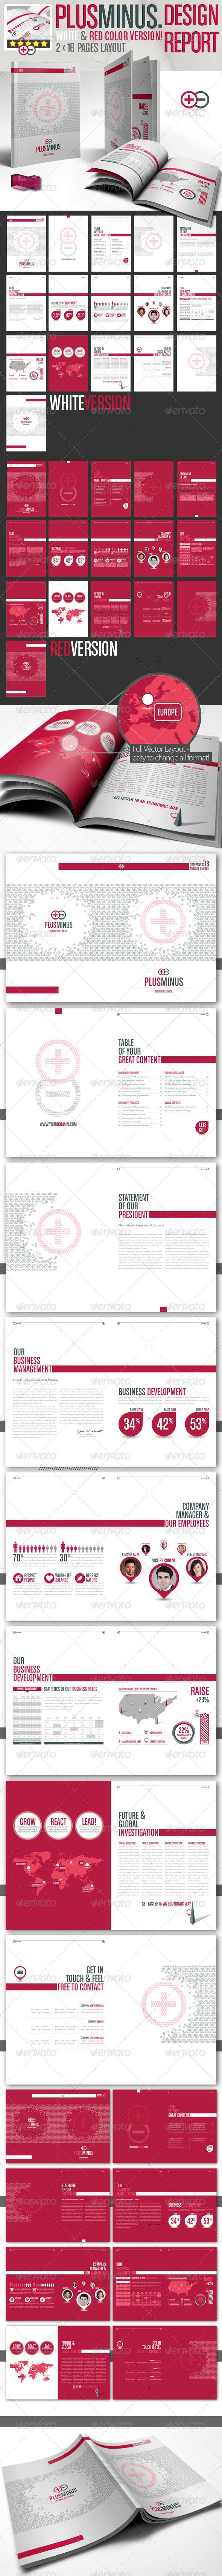 GraphicRiver Corporate Brochure PLUSMINUS A4 2 Color Version 2615723